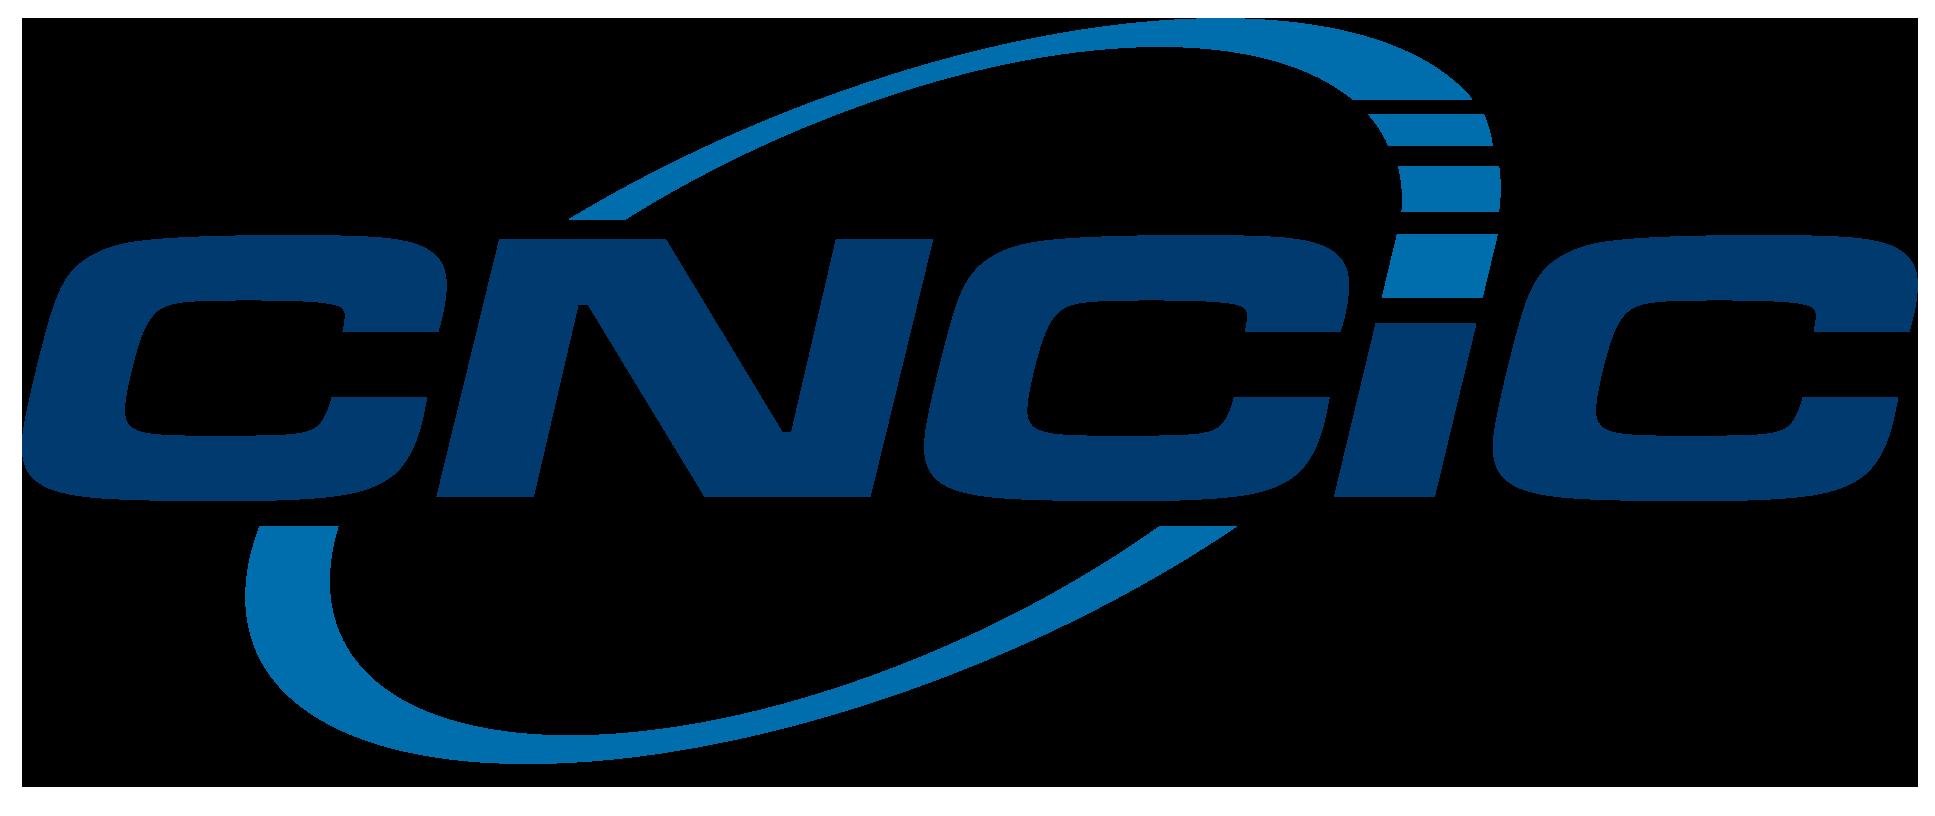 logo中国化信简化版-01.png